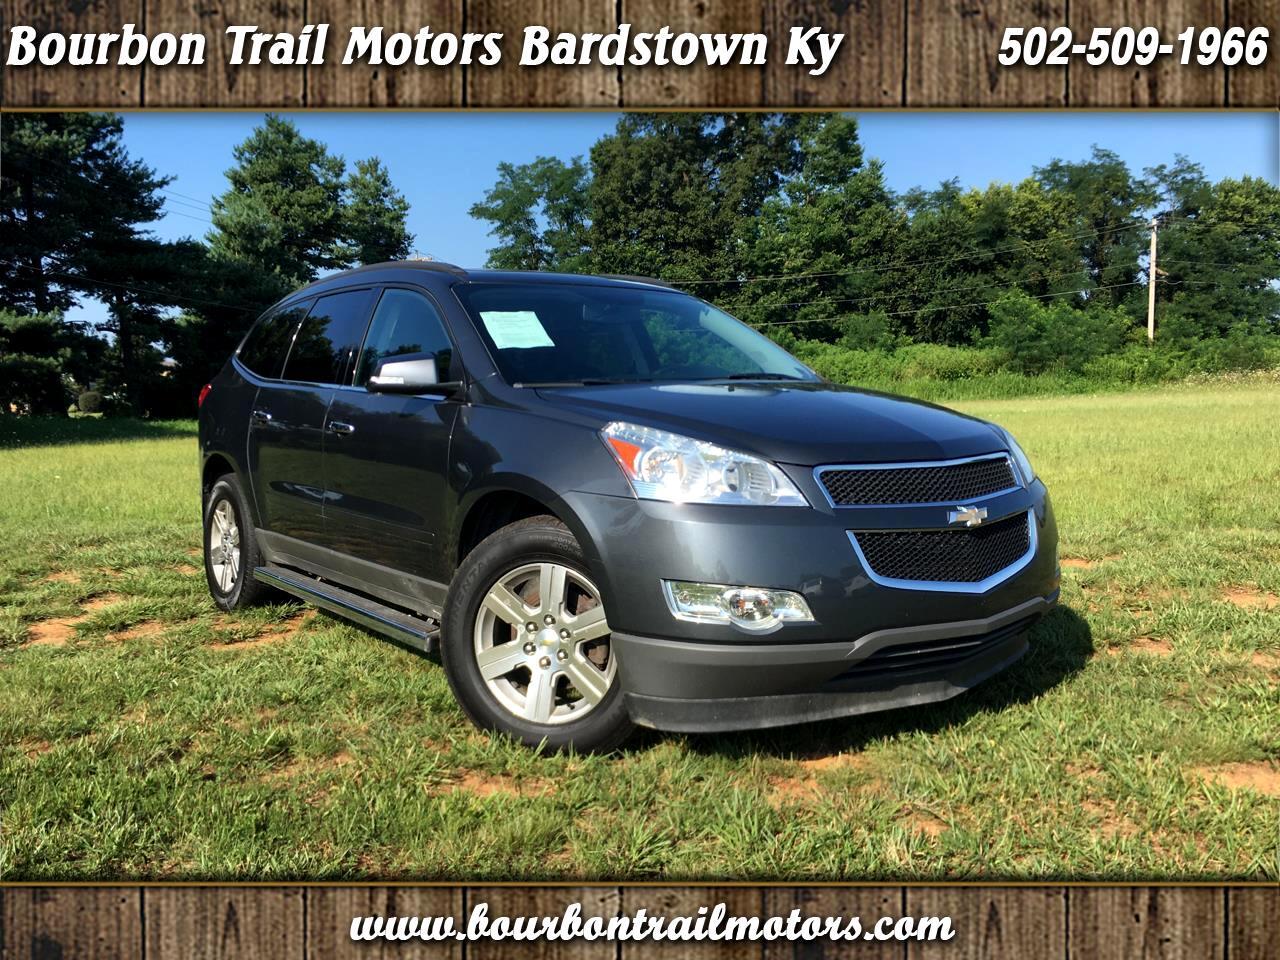 2012 Chevrolet Traverse AWD 4dr LT w/2LT